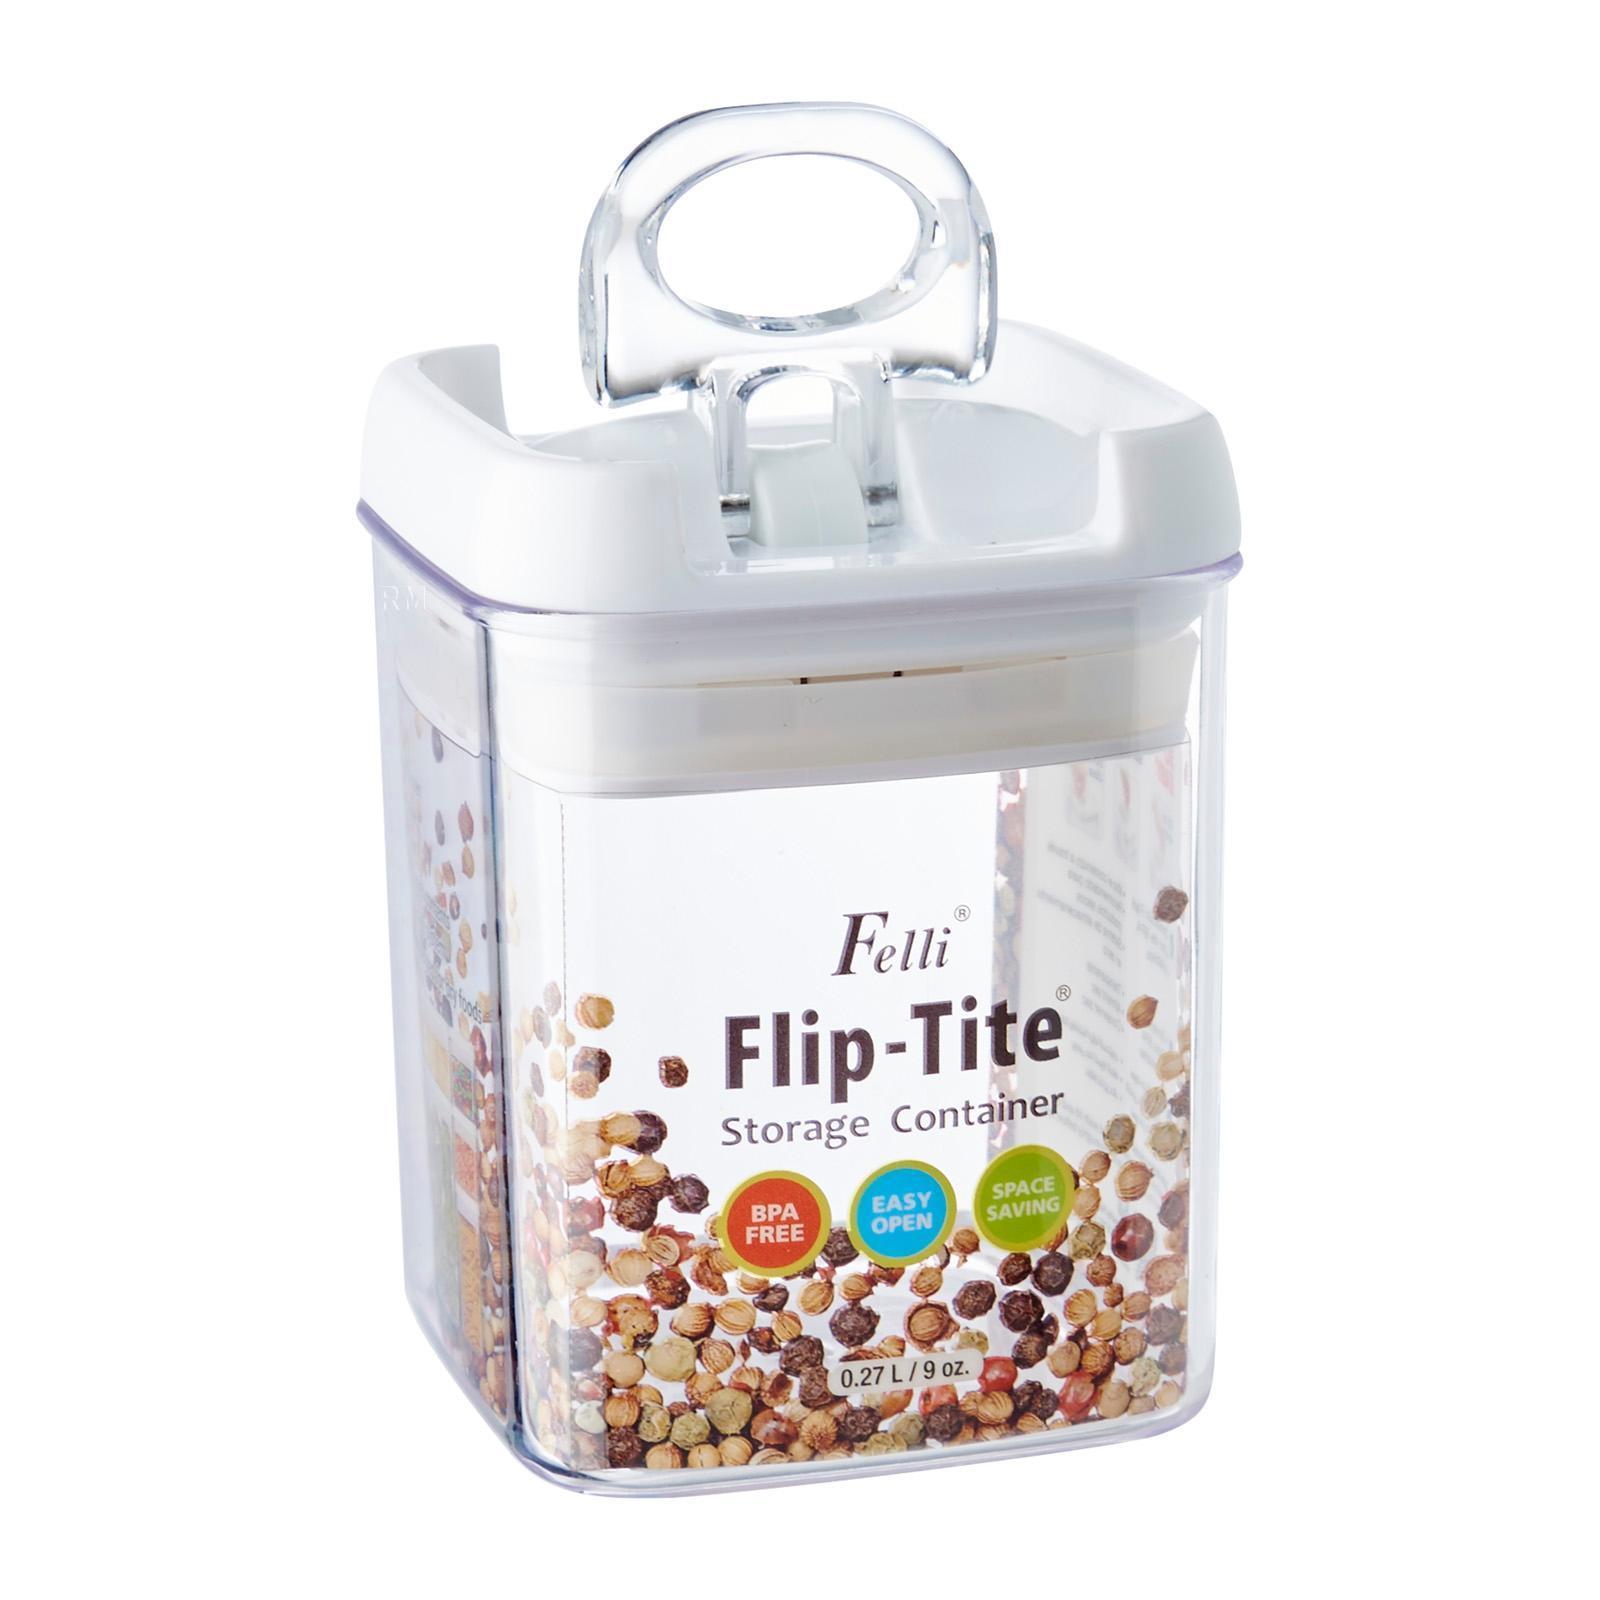 Felli Square Flip Tite Storage Container 0.27 L